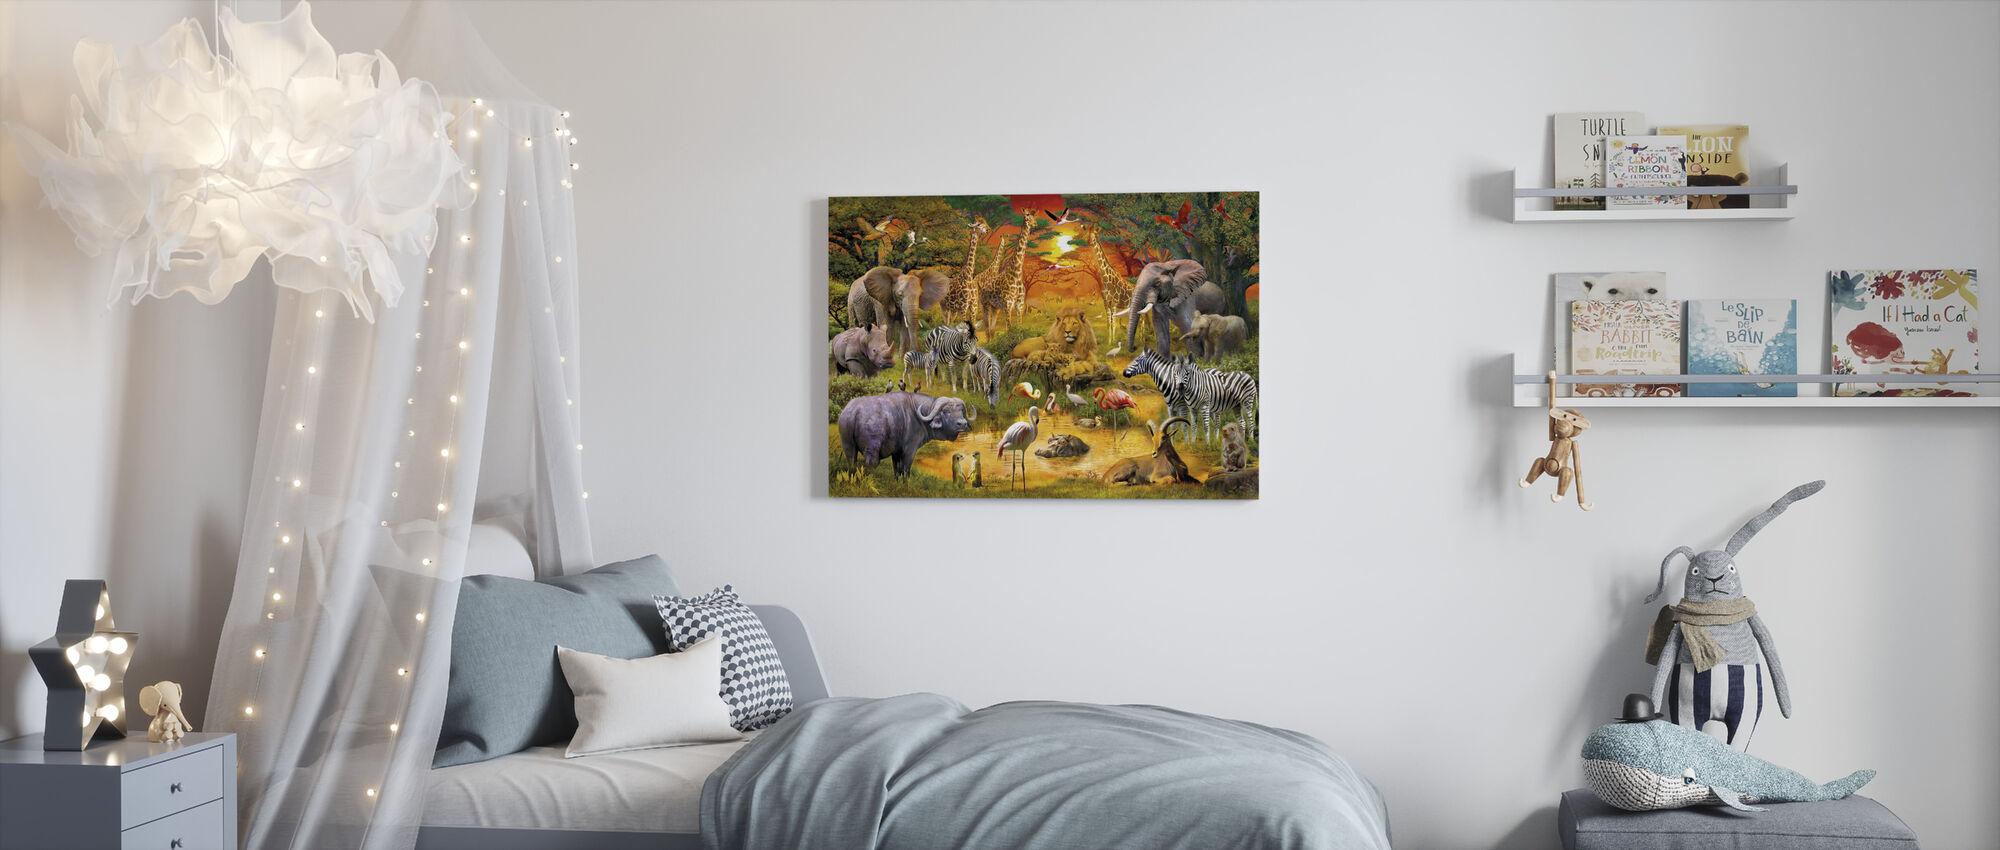 Afrikaanse harmonie - Canvas print - Kinderkamer